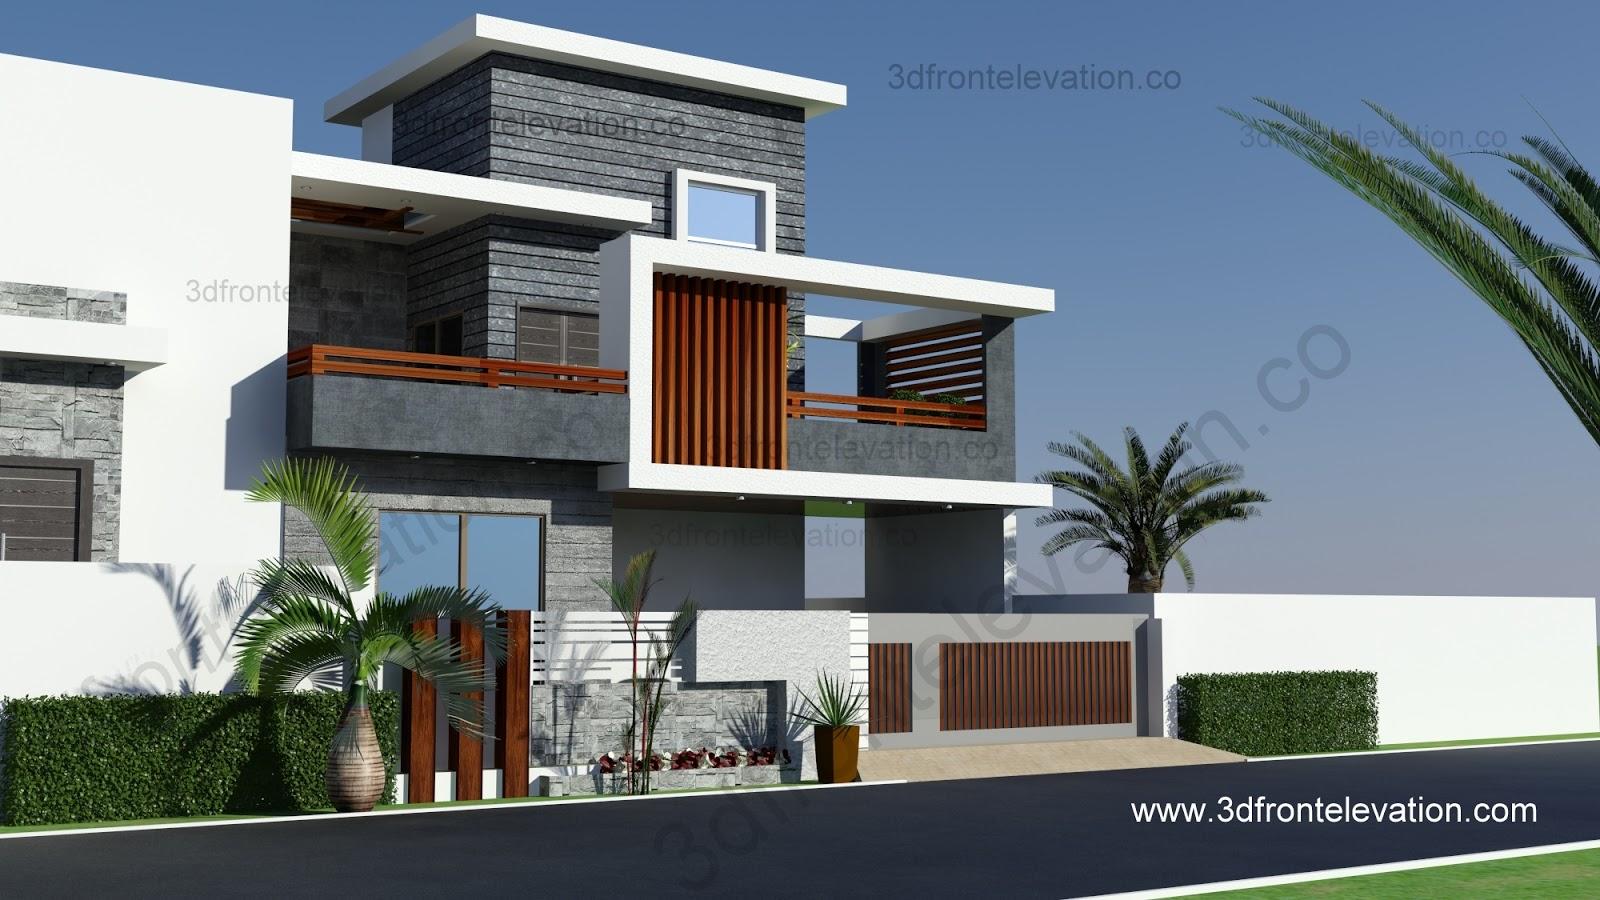 Home Design 10 Marla Part - 31: 10 Marla Elevation. ??? ????? ???? ?? ?????????